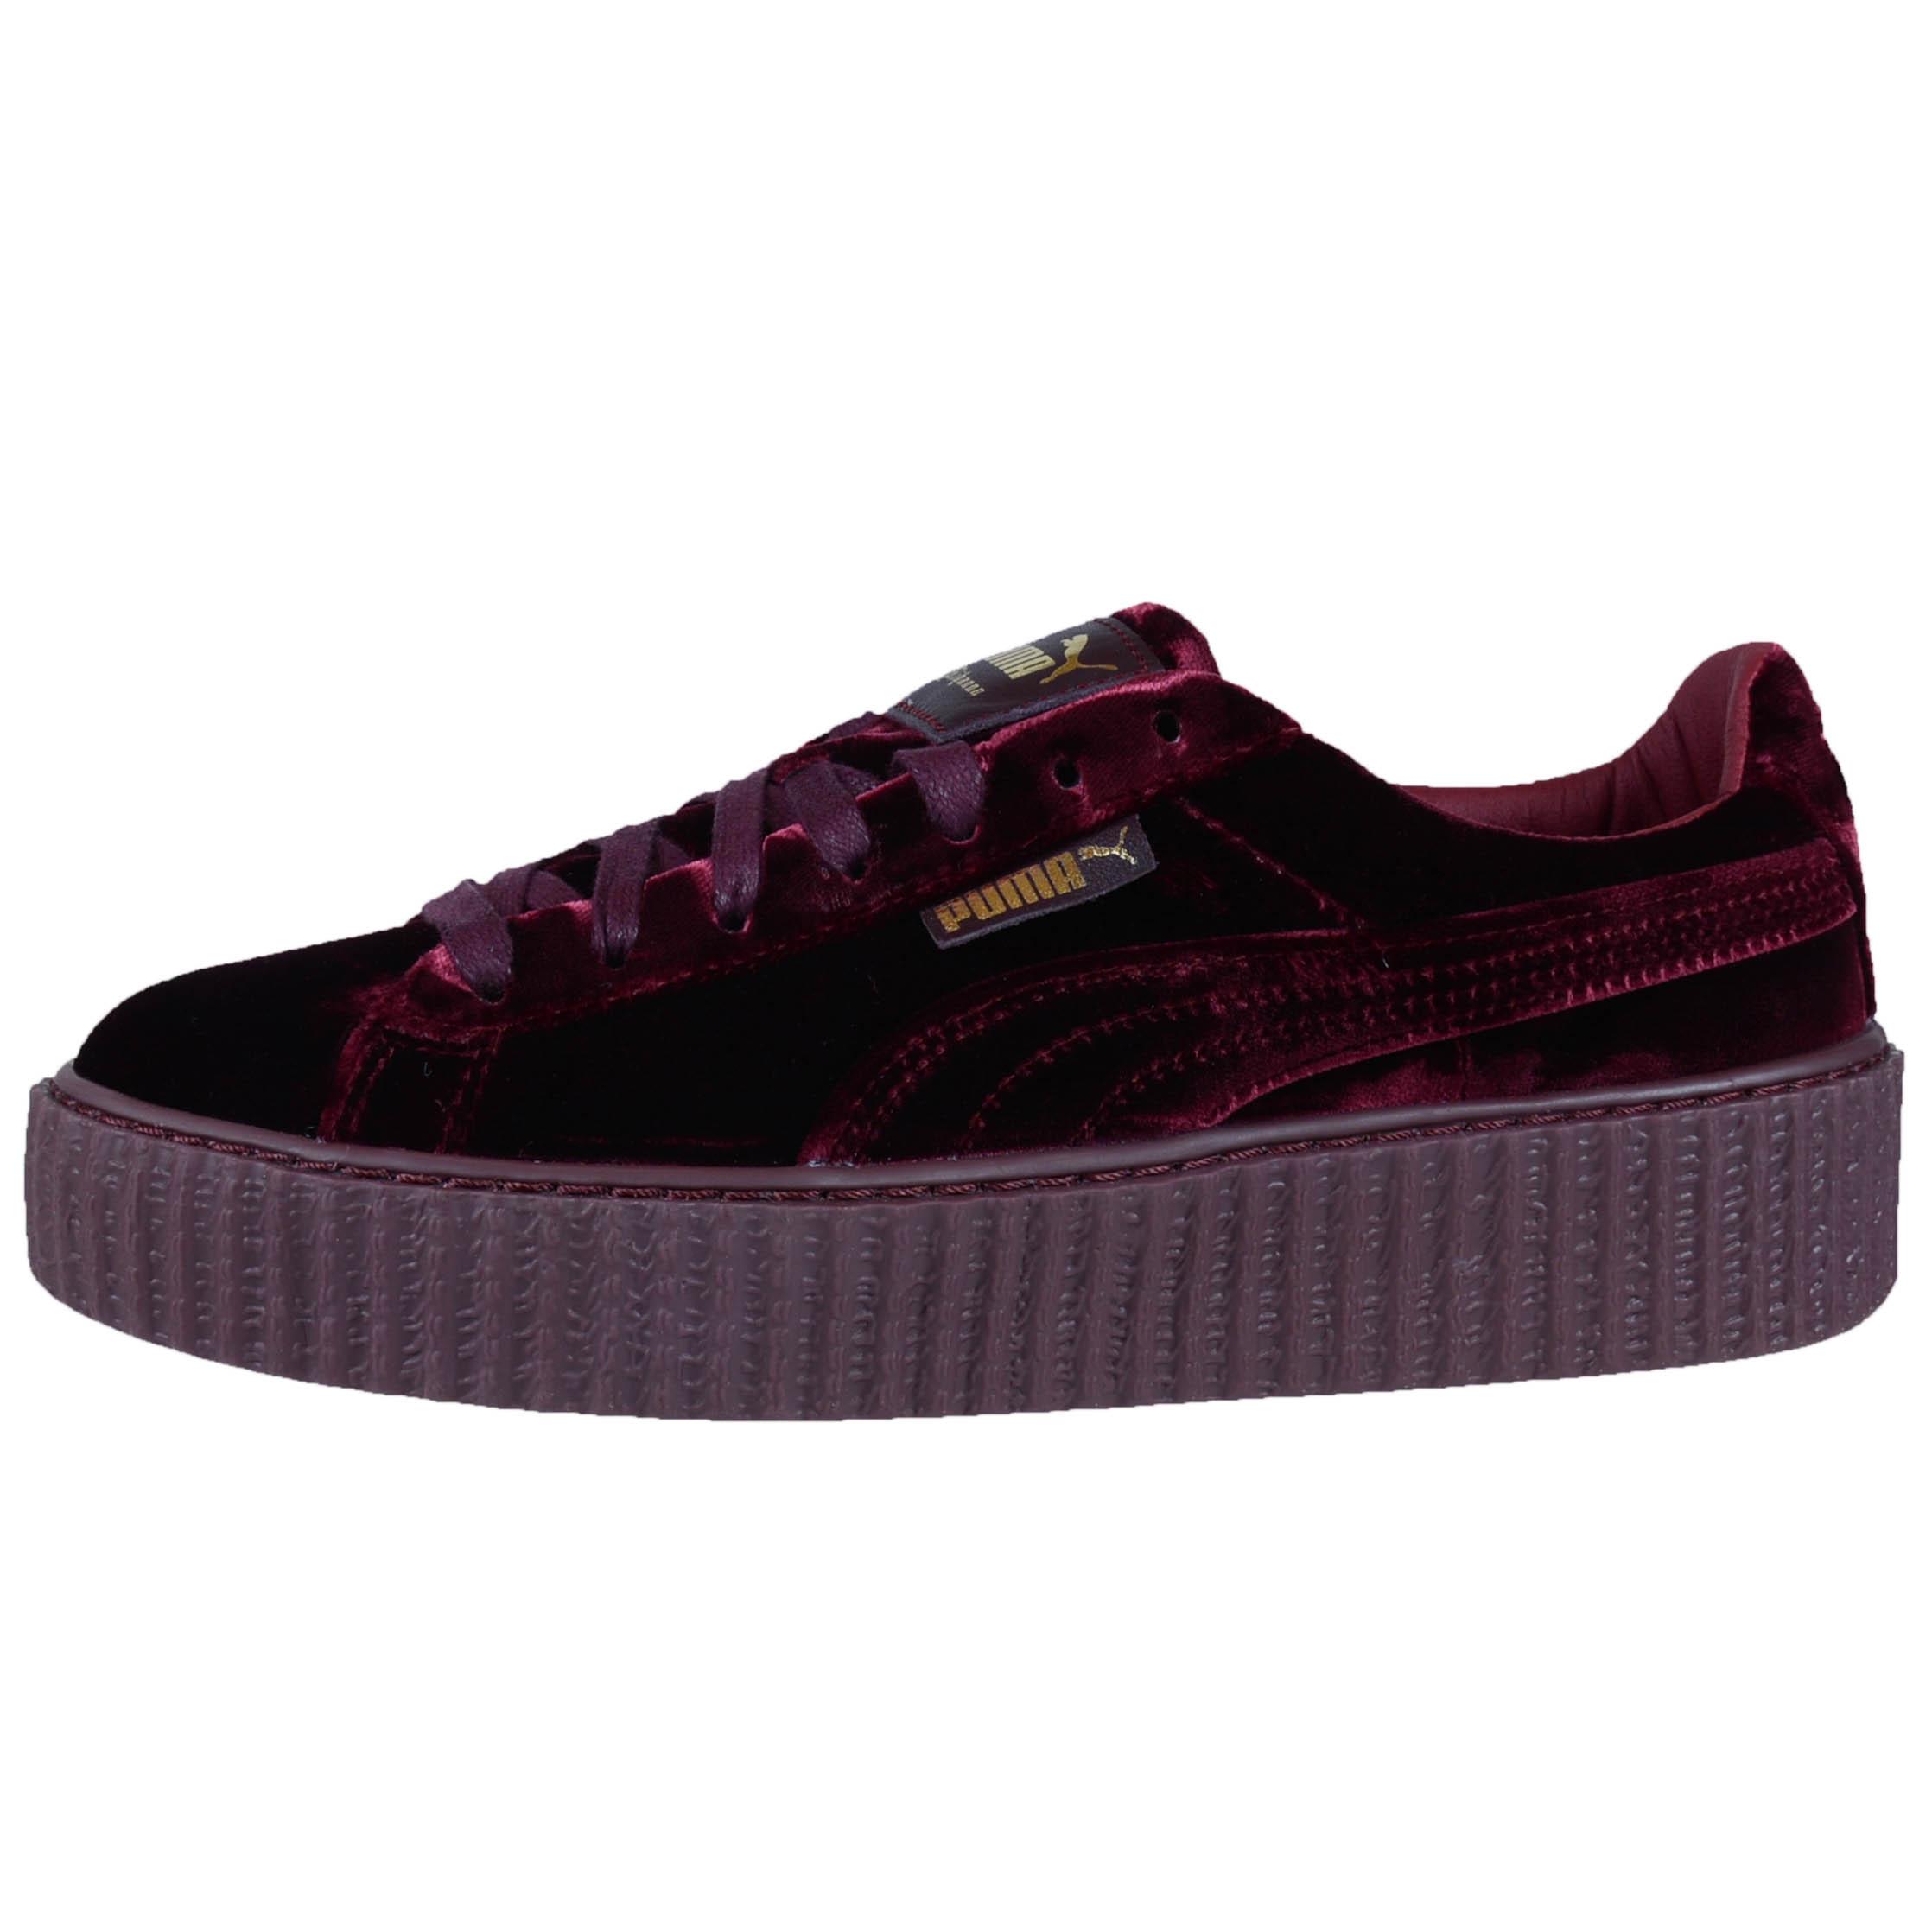 Puma Shoes Black Red Gray